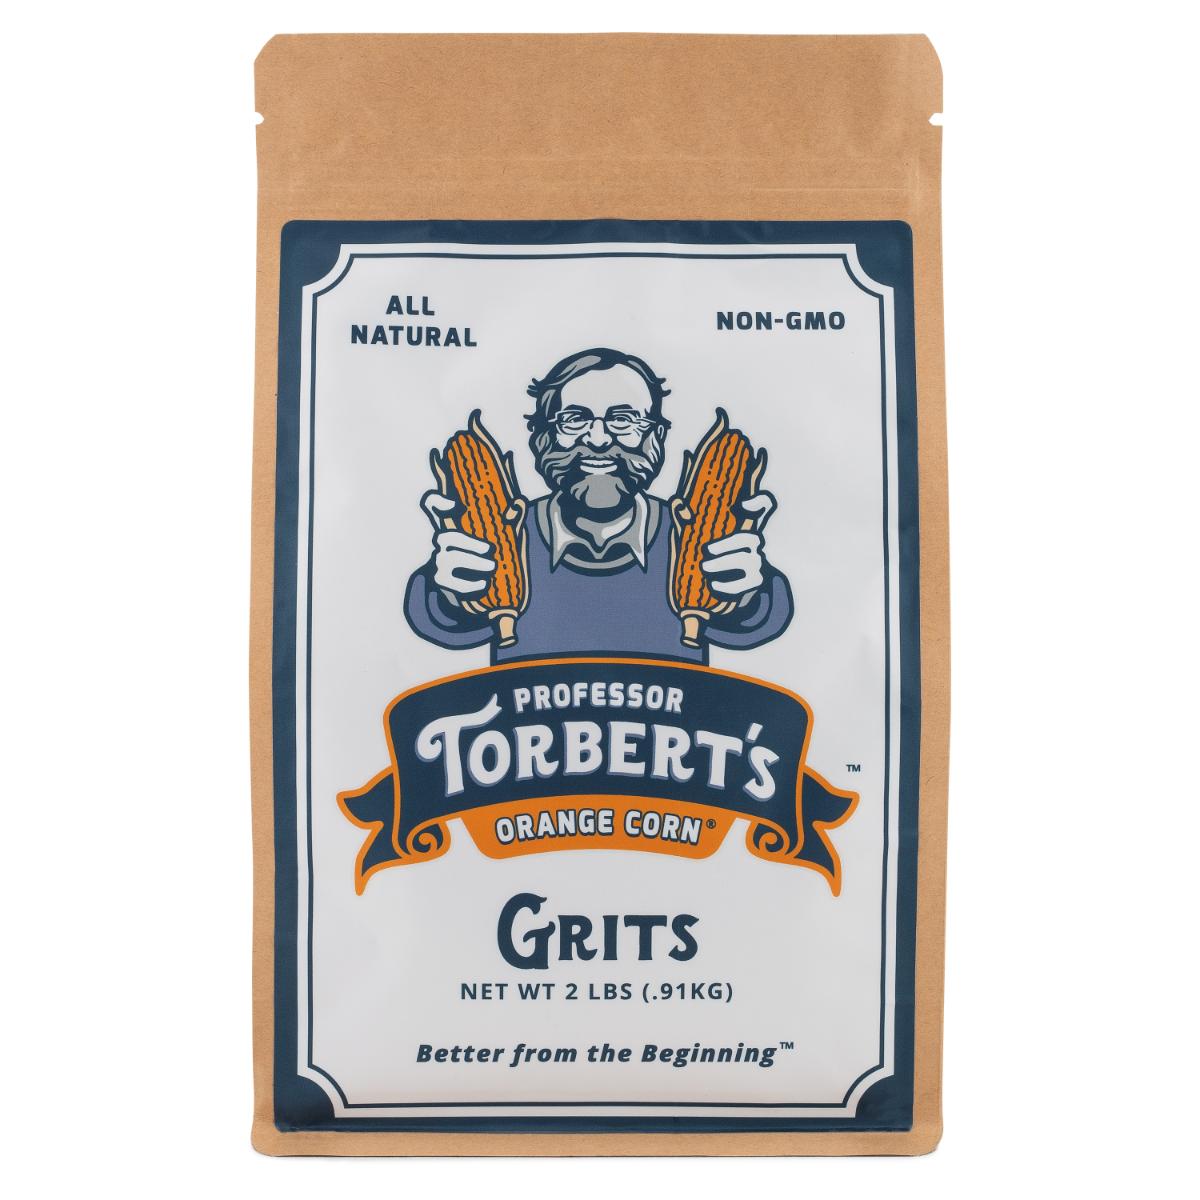 professor-torberts-orange-corn-grits-2lb-bag-32oz